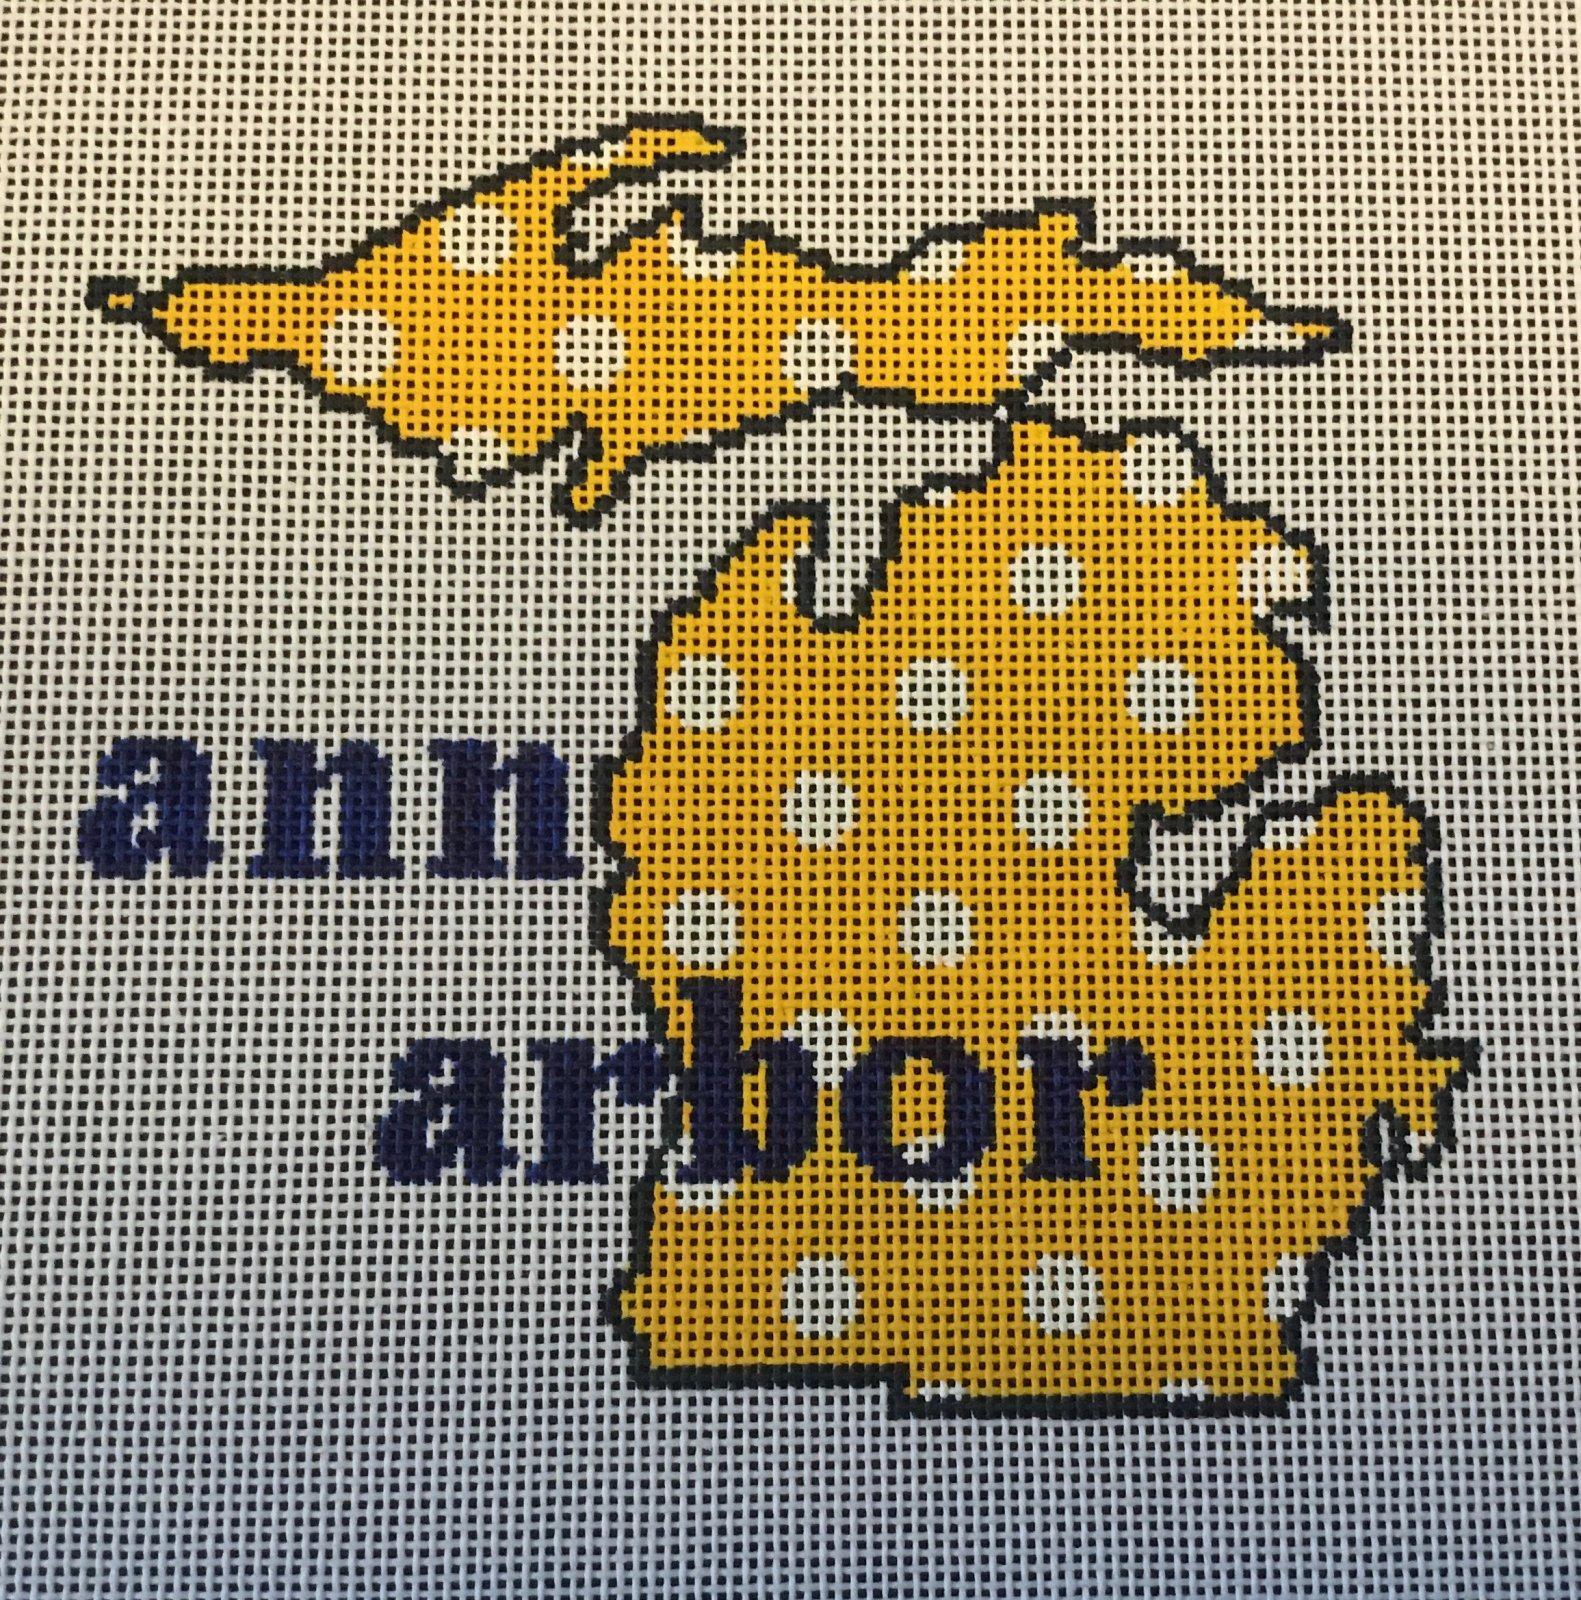 Ann Arbor,State Shape, 18 ct.,5x5 1/2